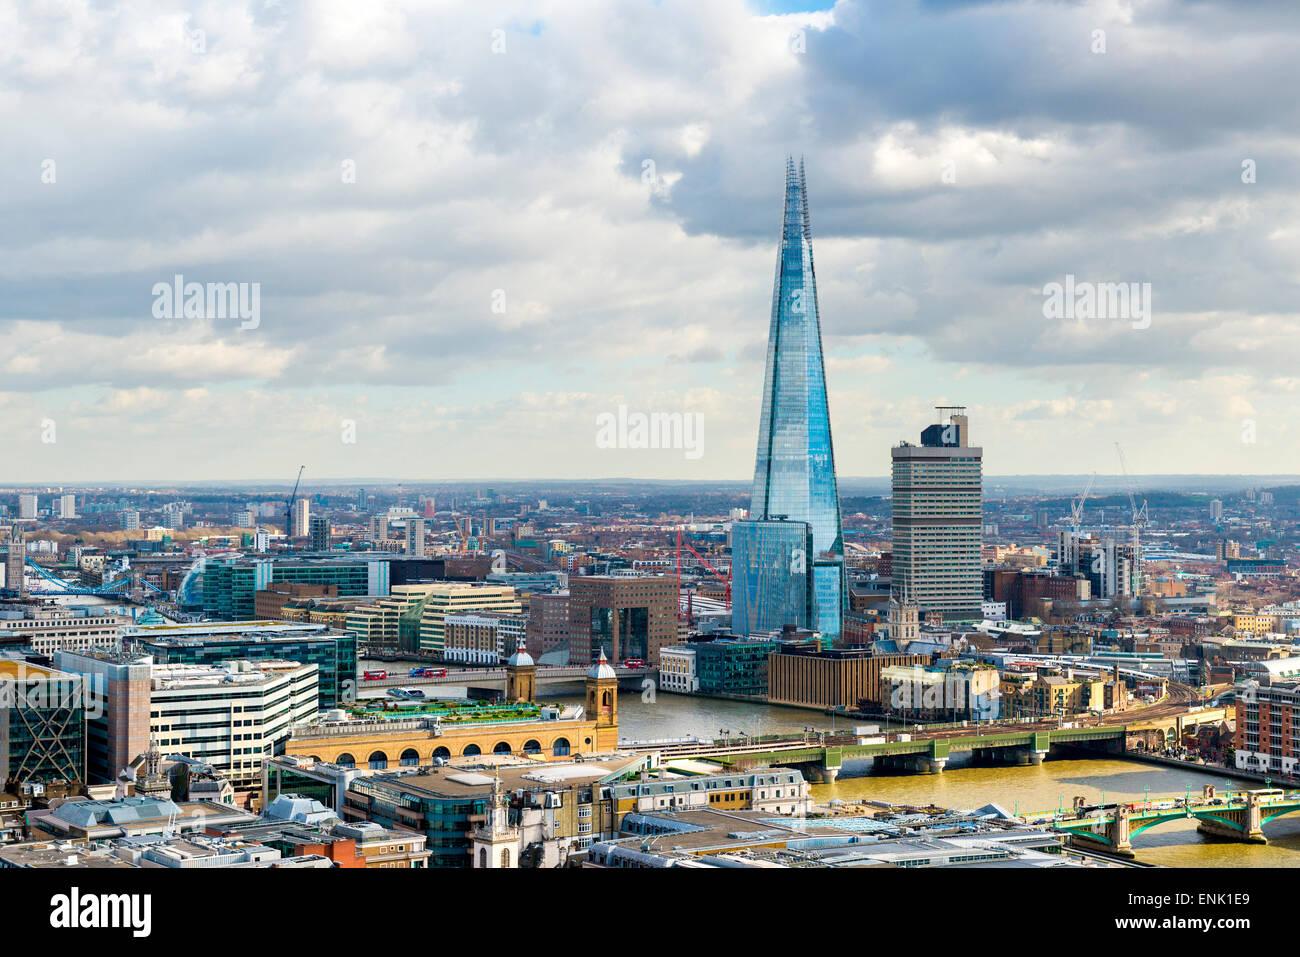 El Shard, Londres, Inglaterra, Reino Unido, Europa Imagen De Stock